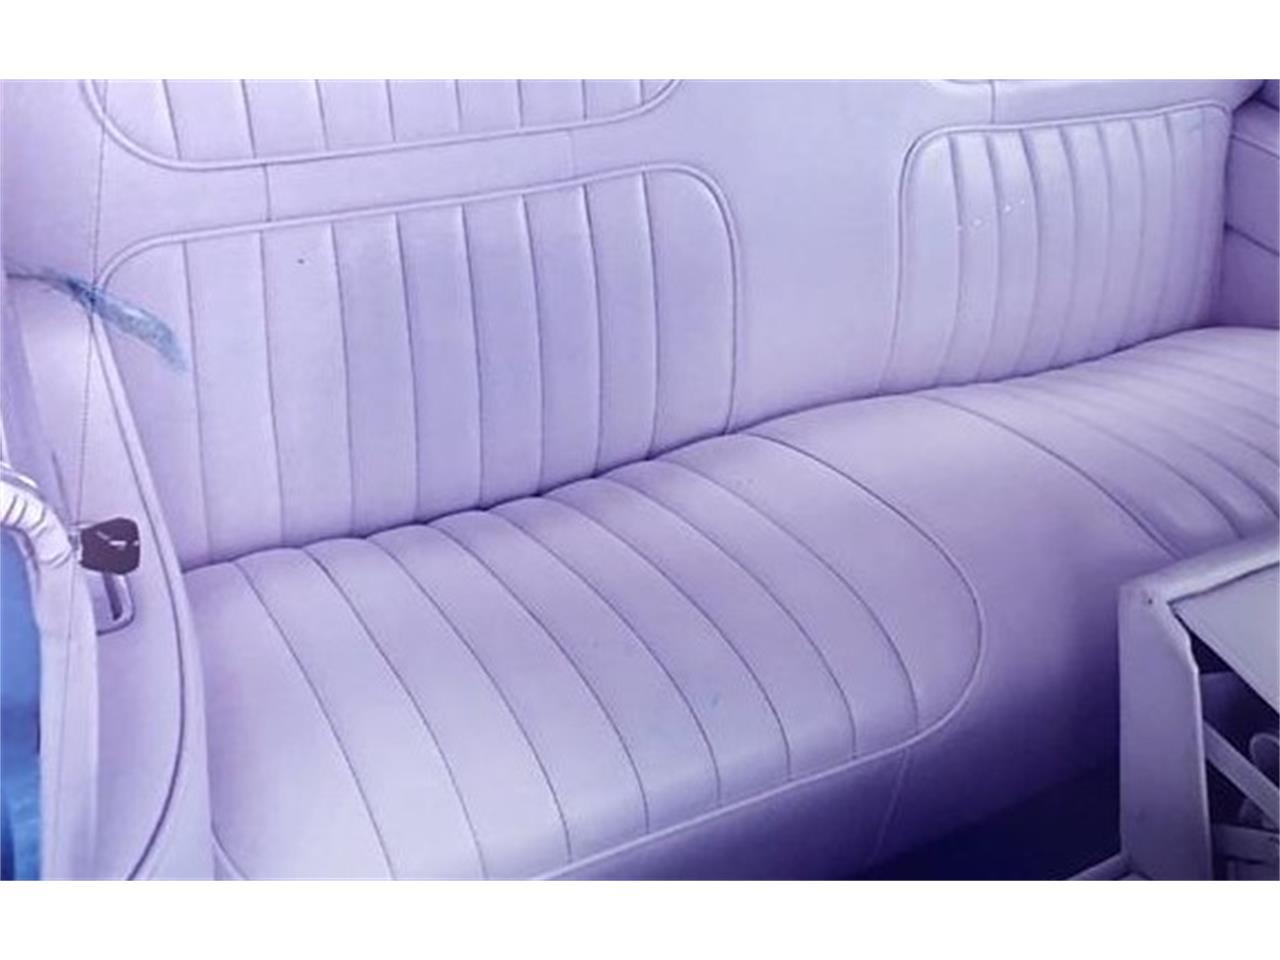 1953 Chevrolet Bel Air (CC-1358946) for sale in Mackenzie , British Columbia